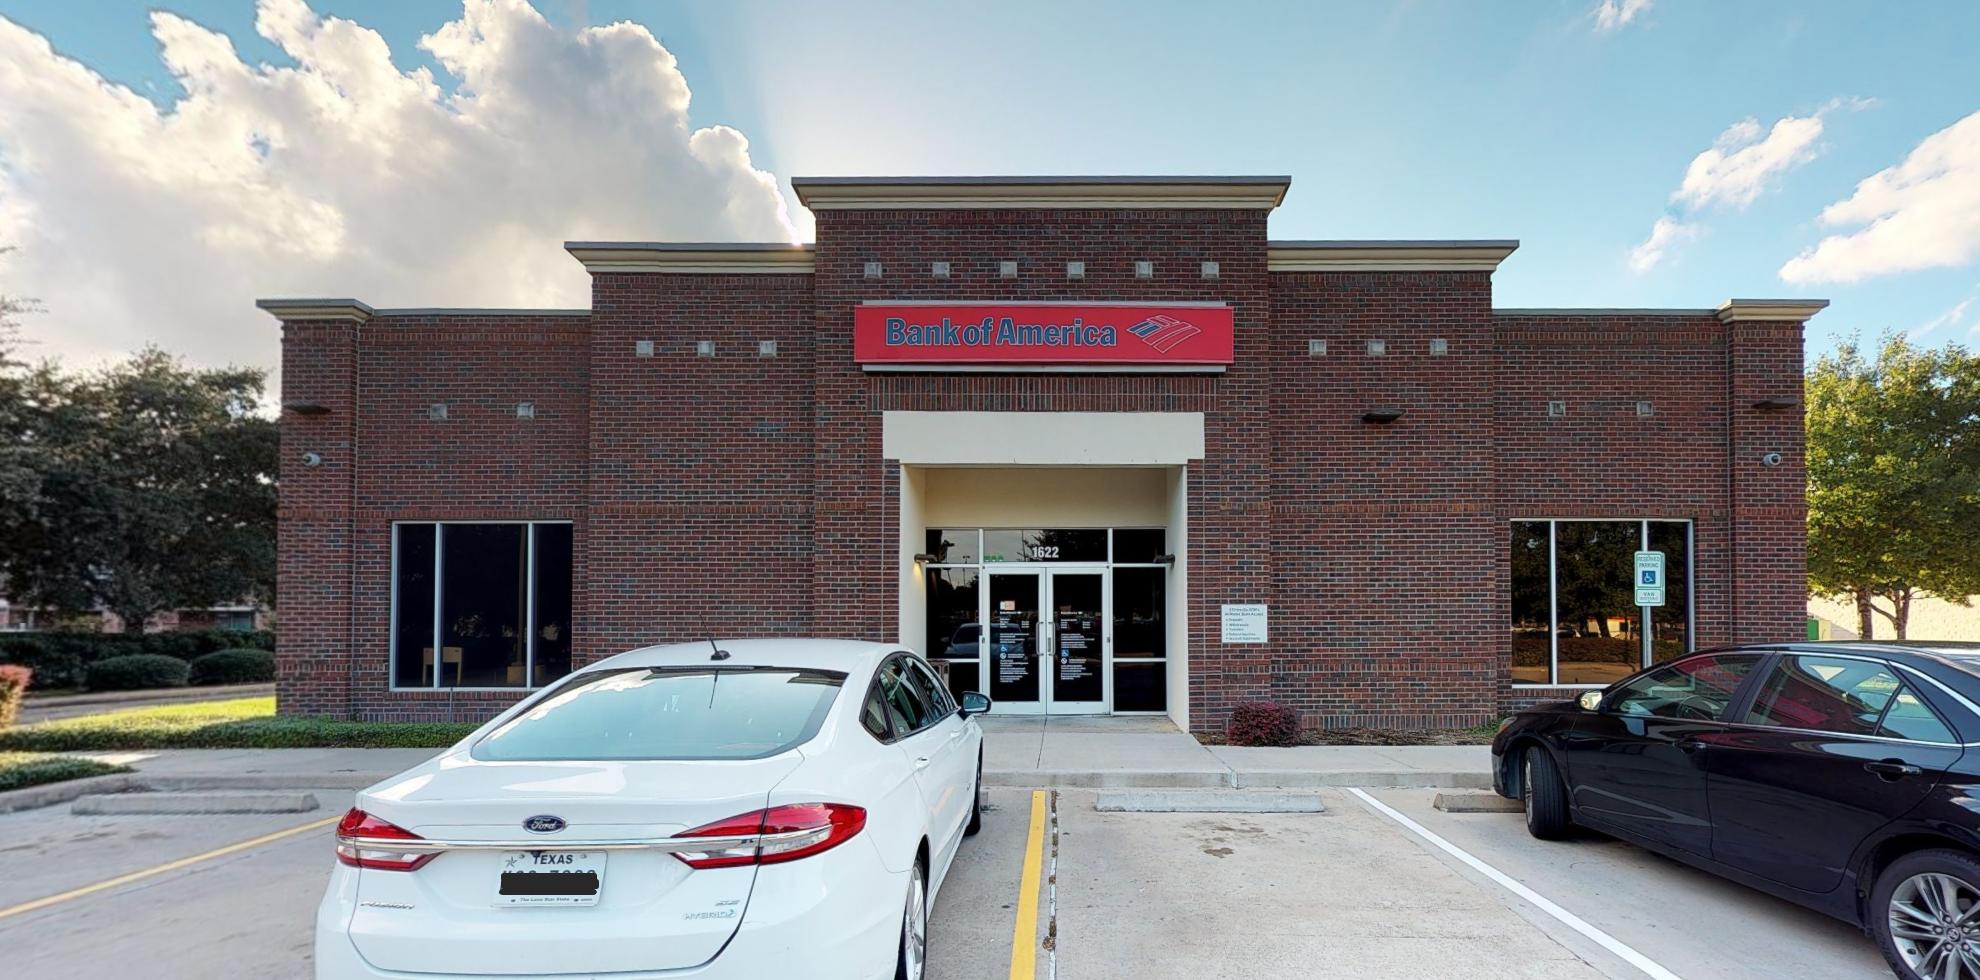 Bank of America financial center with drive-thru ATM | 1622 S Mason Rd, Katy, TX 77450